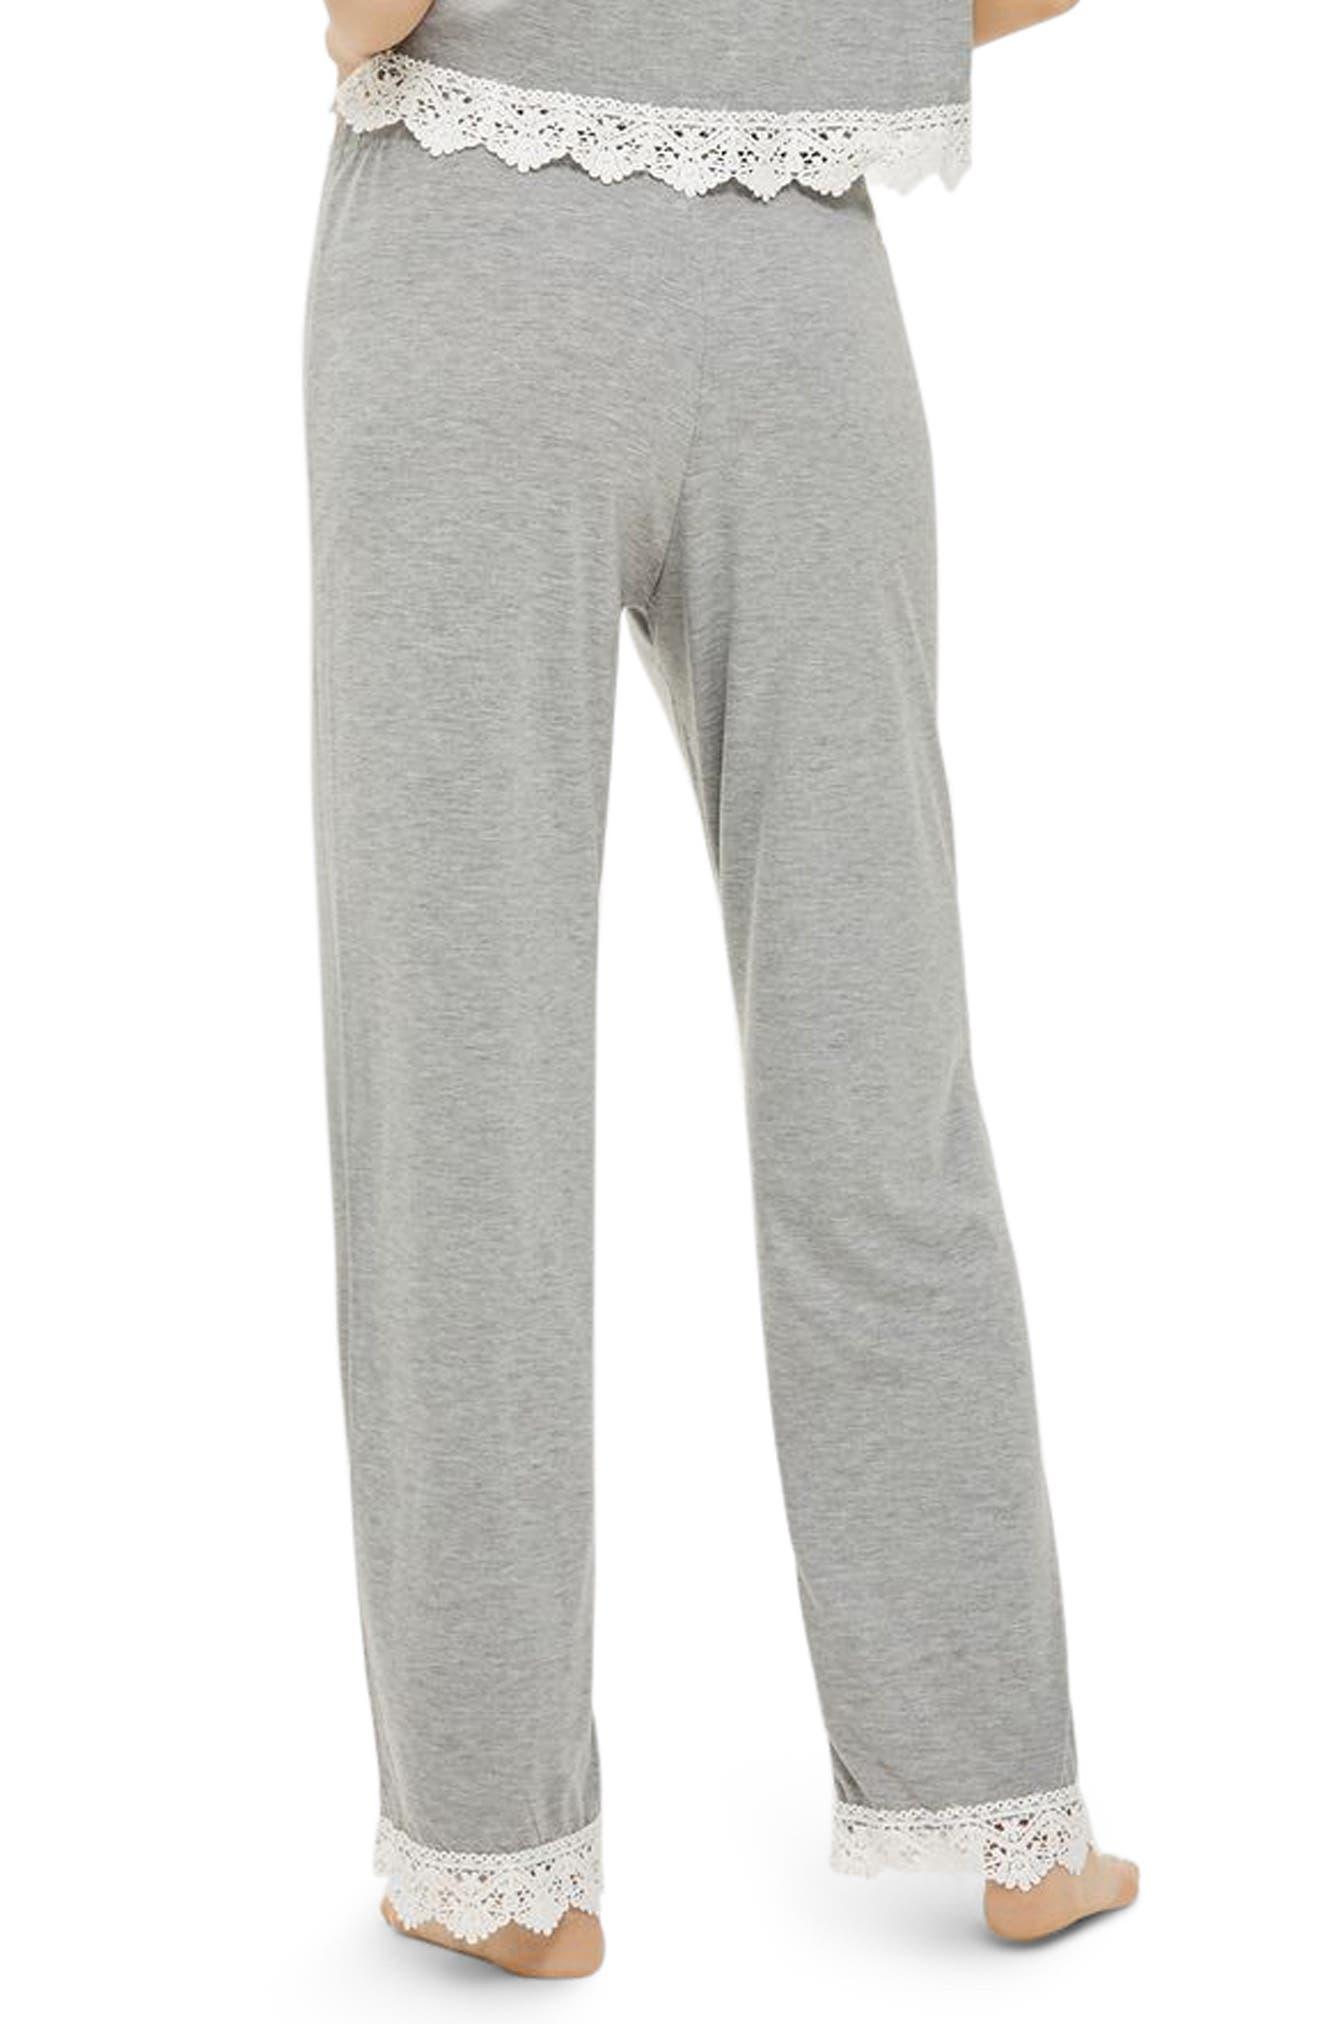 Crochet Trim Pajama Pants,                             Alternate thumbnail 2, color,                             020